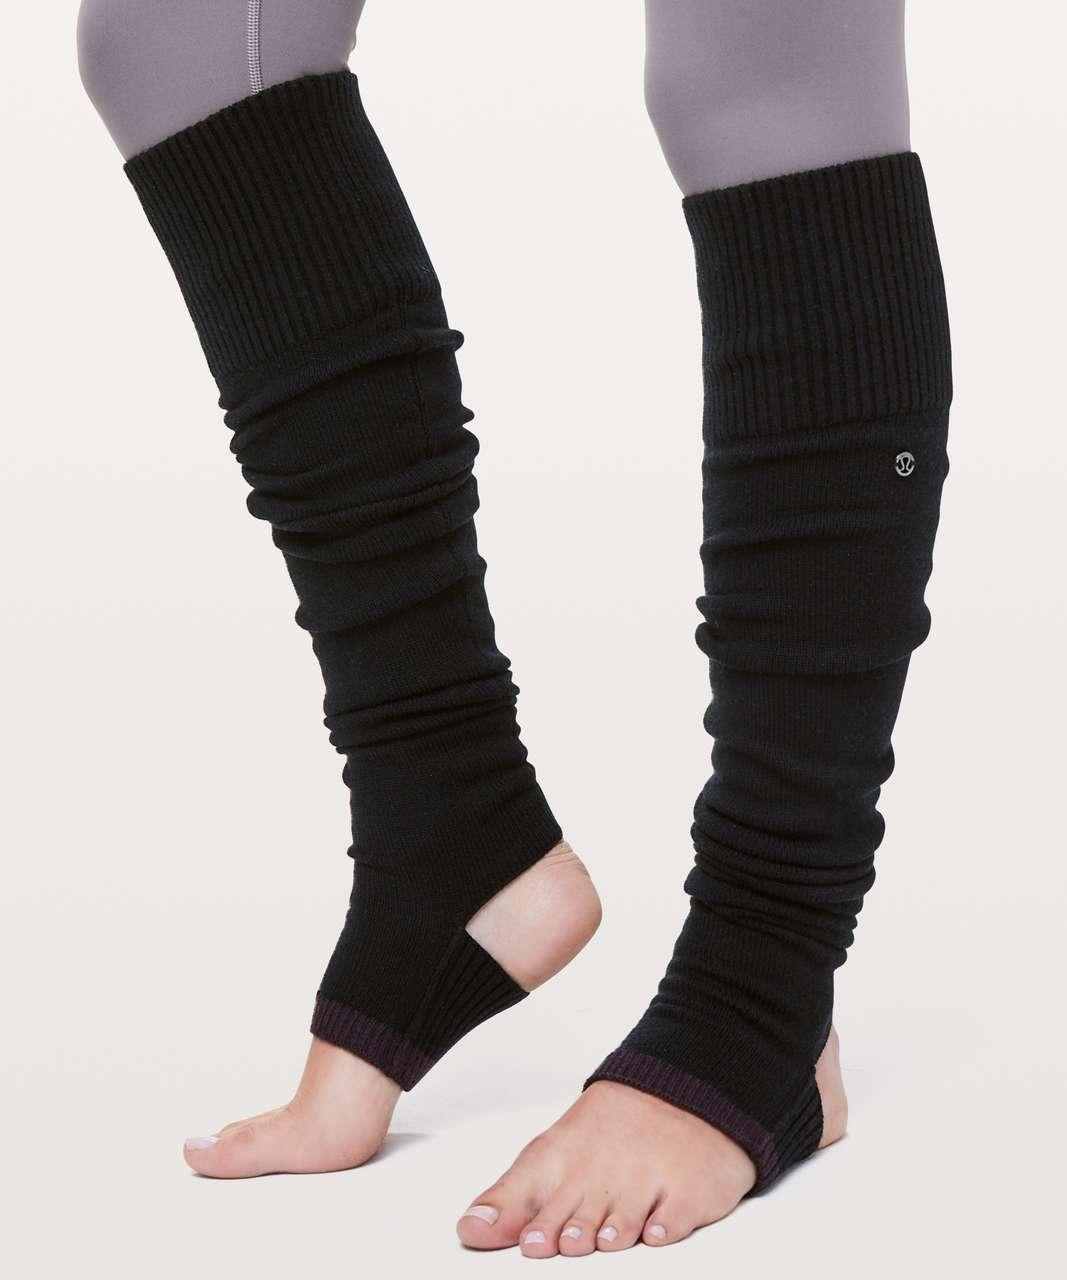 Lululemon Evolution Leg Warmers - Black / Black Cherry